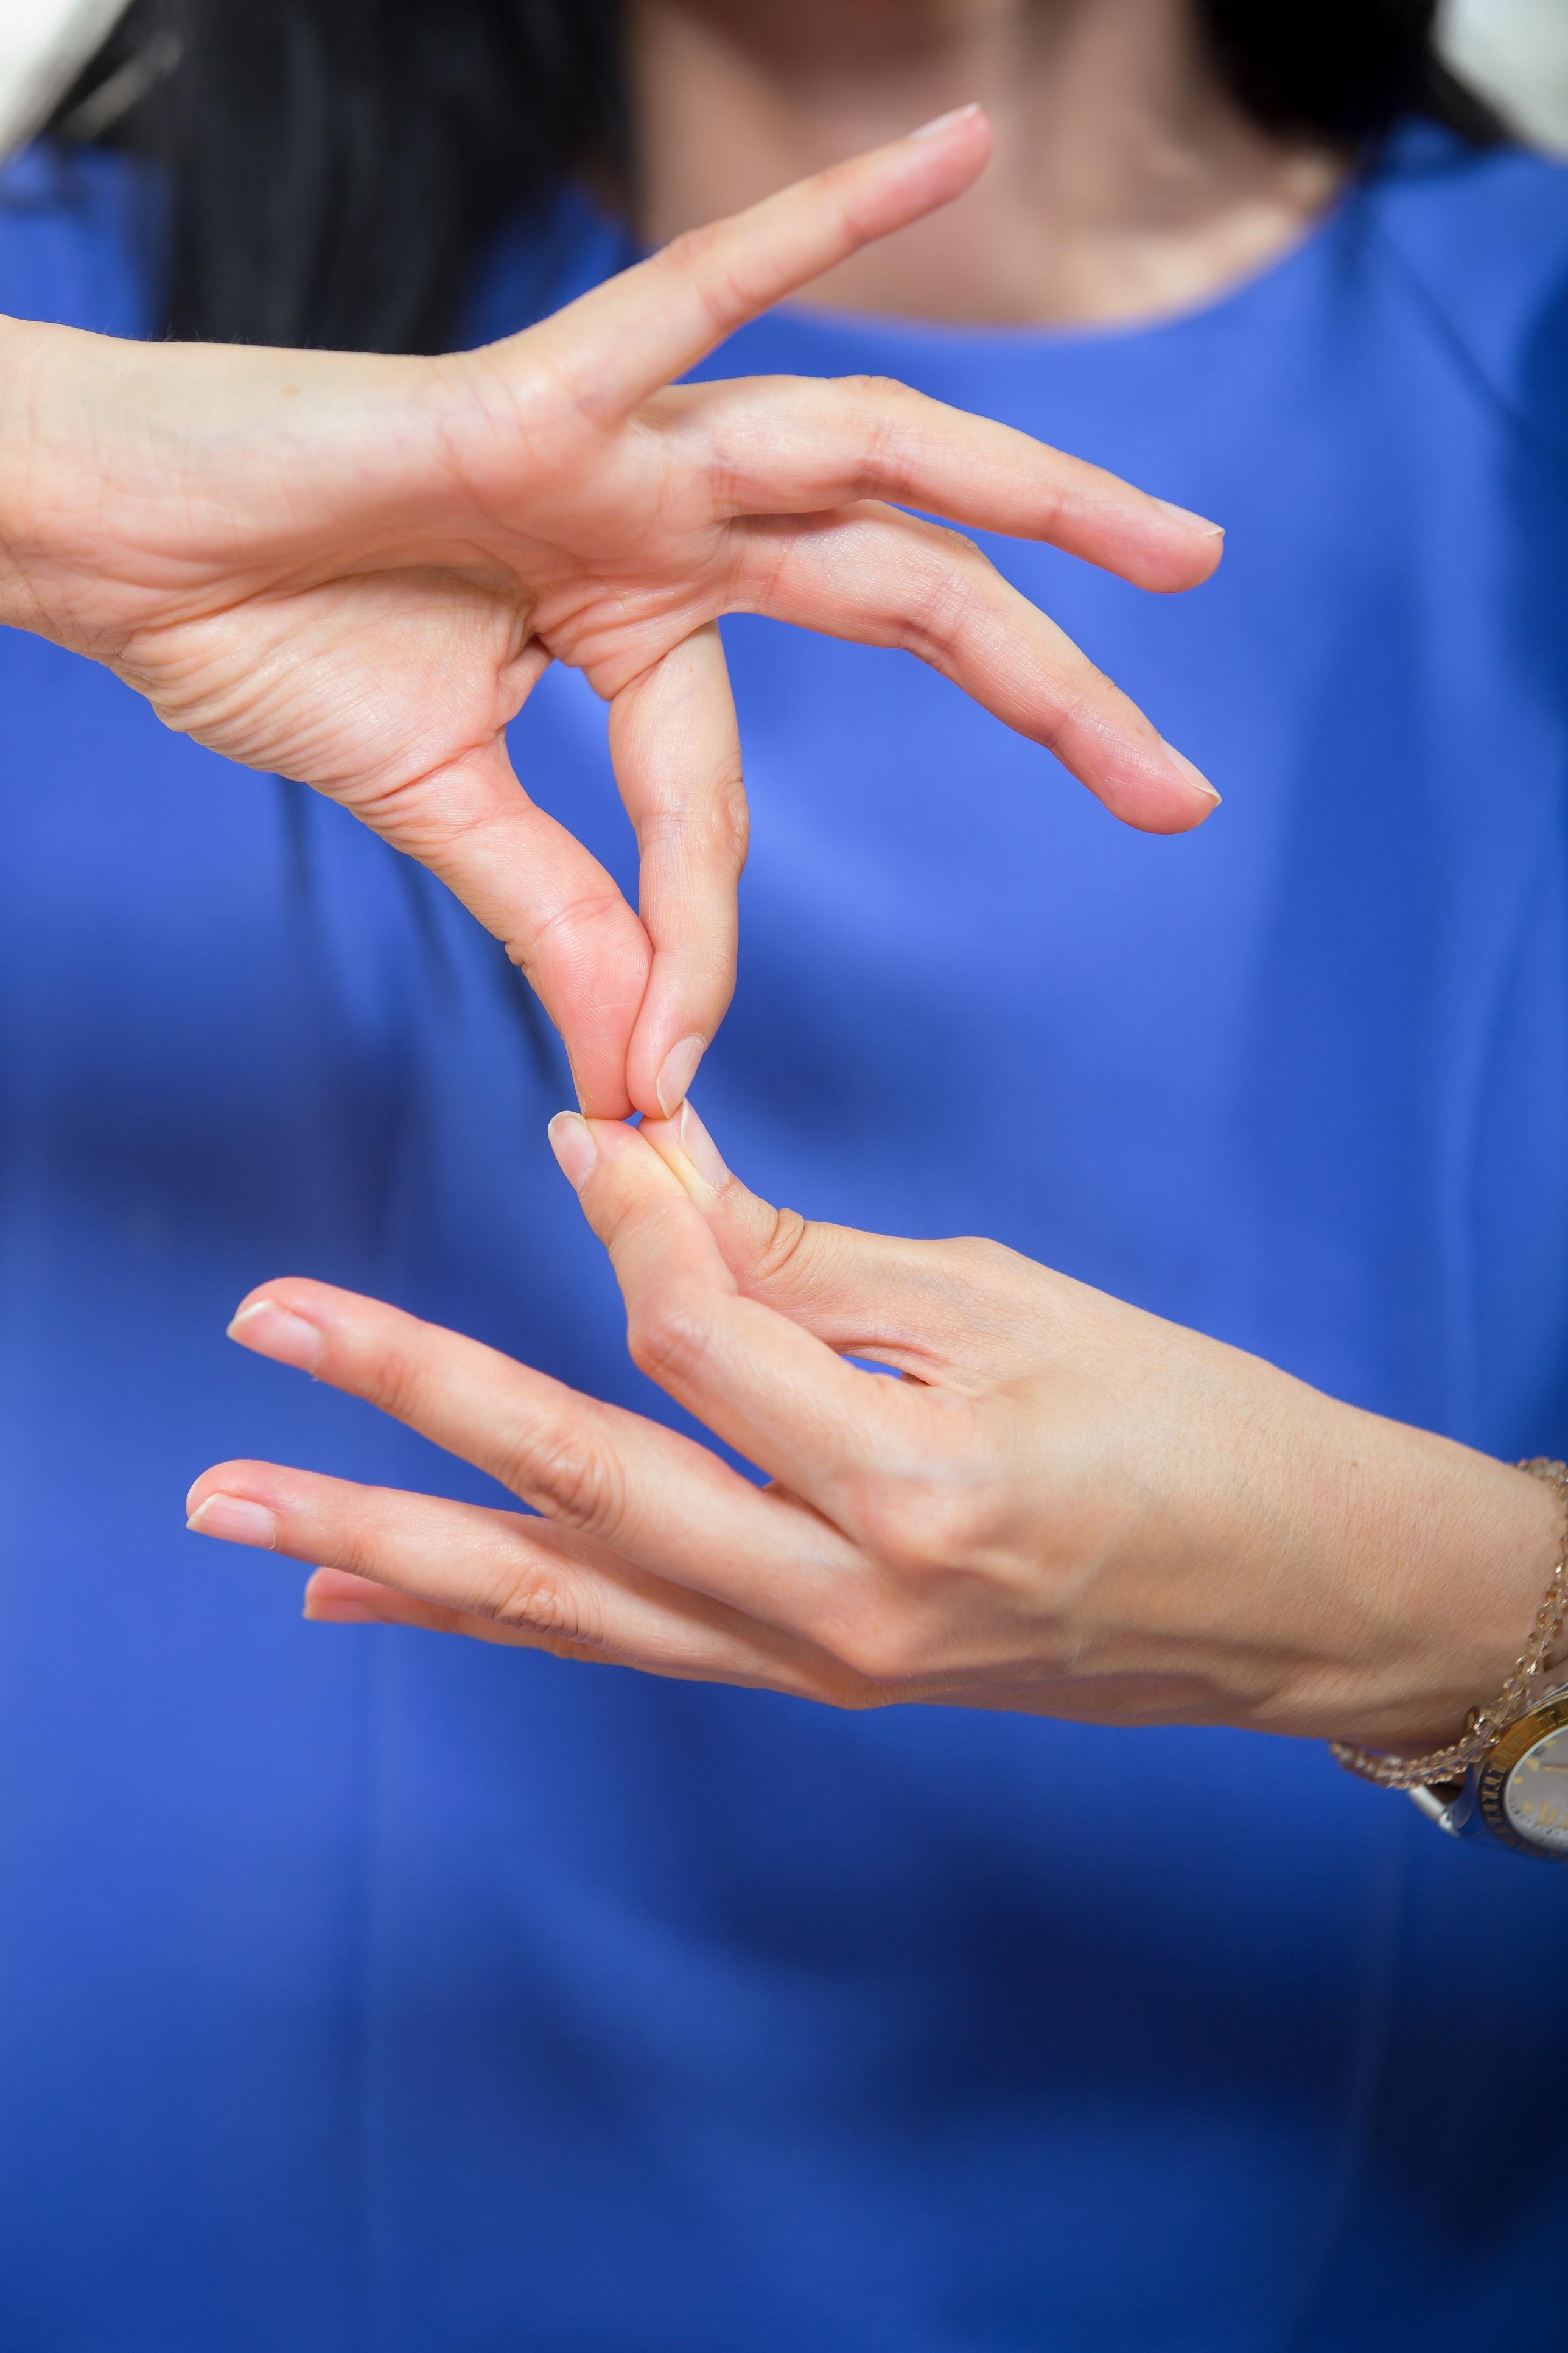 sign language pic